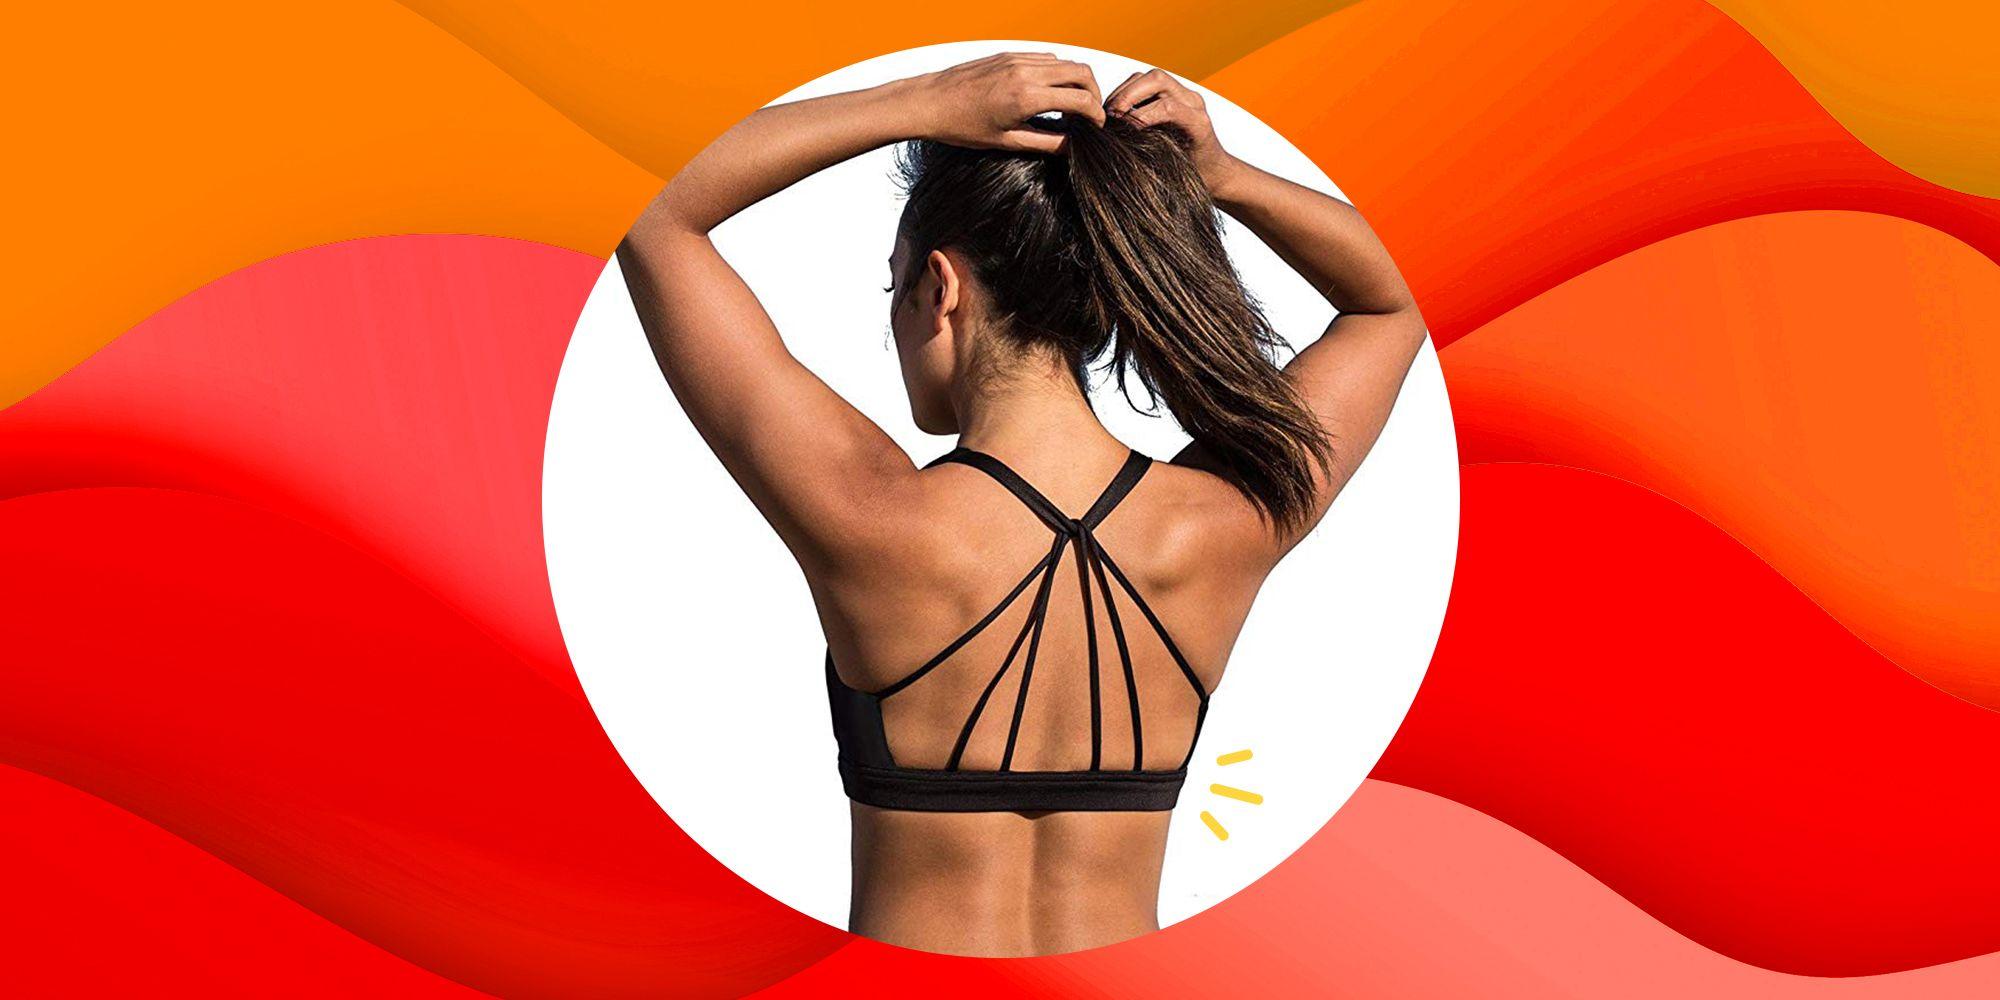 This $17 Yoga Sports Bra Has 600 5-Star Reviews On Amazon